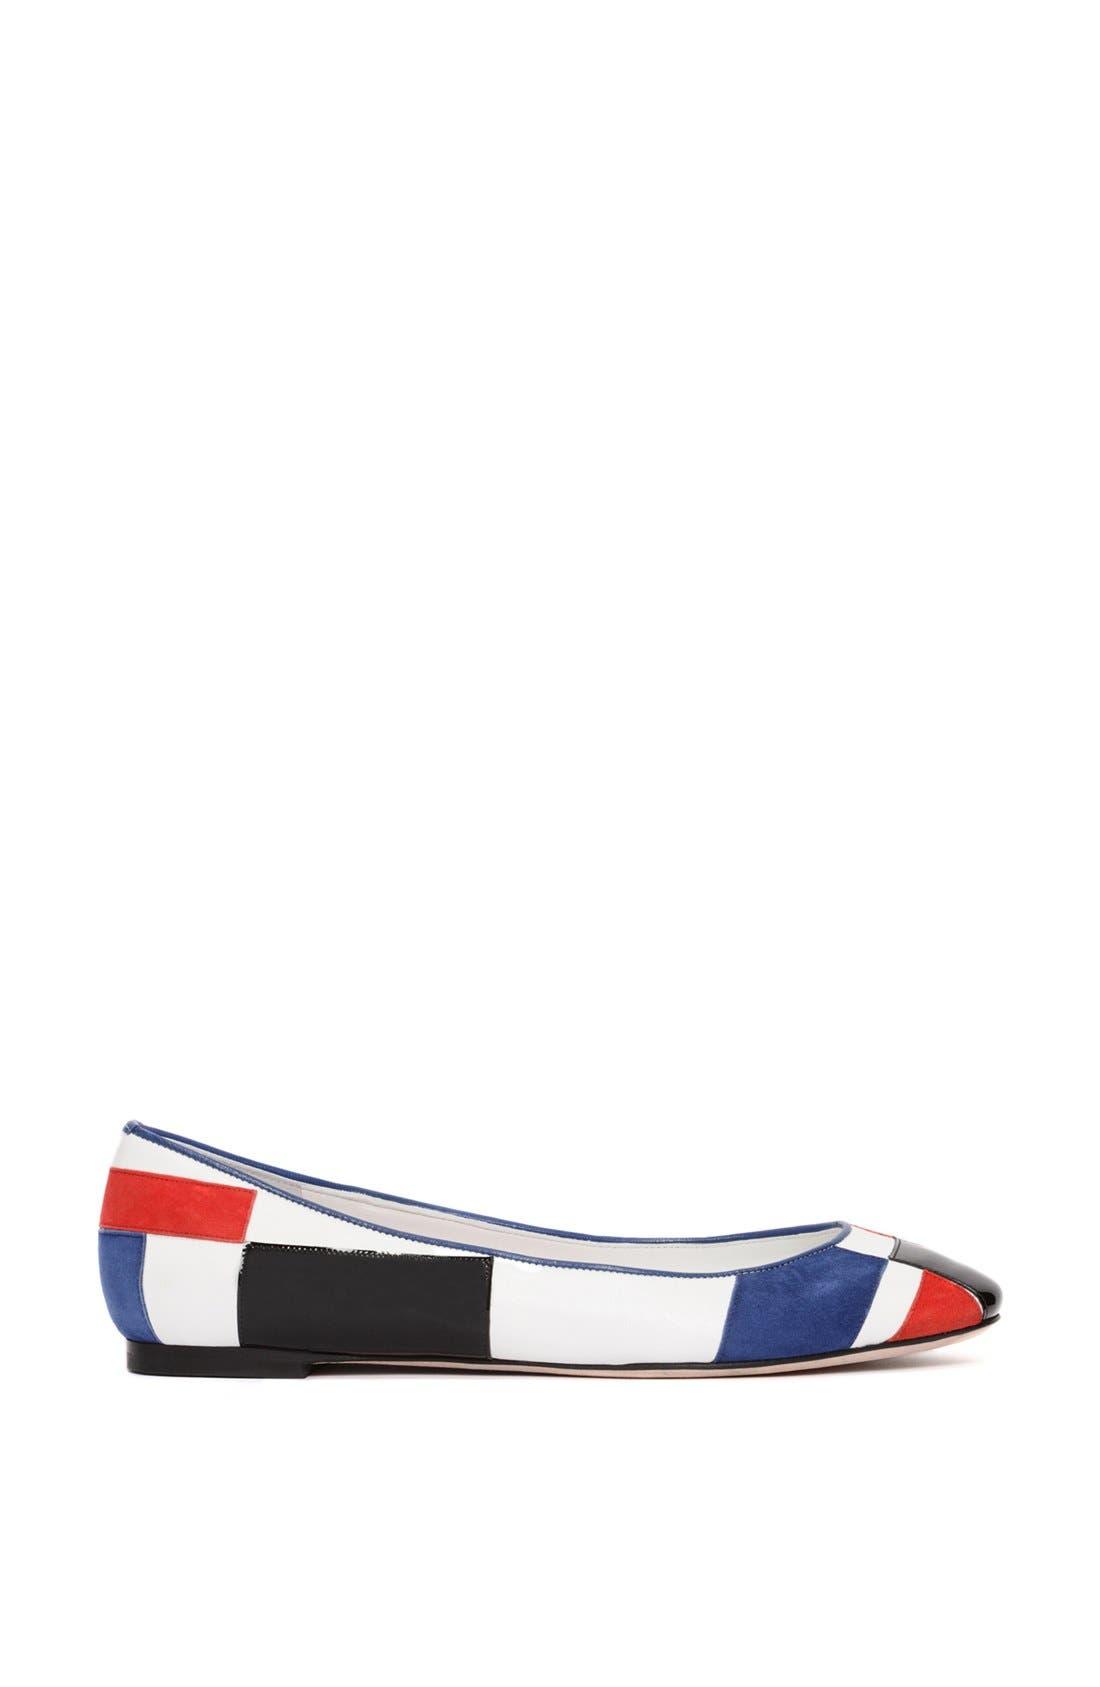 Alternate Image 4  - Alexander McQueen 'Mondrian' Ballet Flat